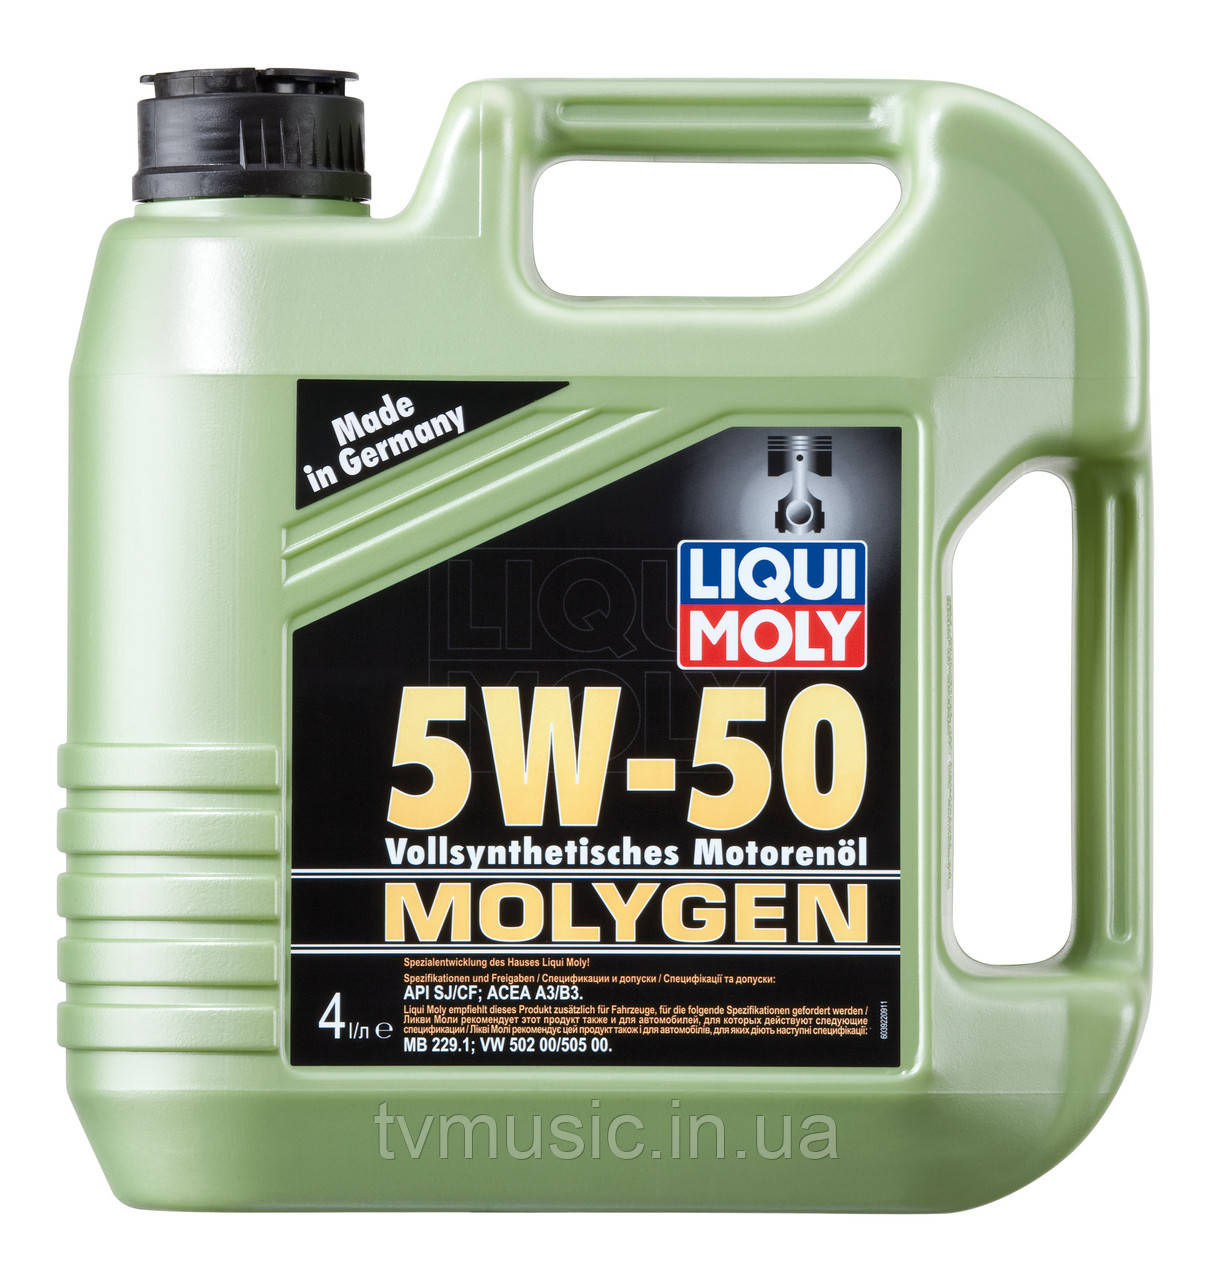 Масло моторное Liqui Moly Molygen 5W-50 4 литра